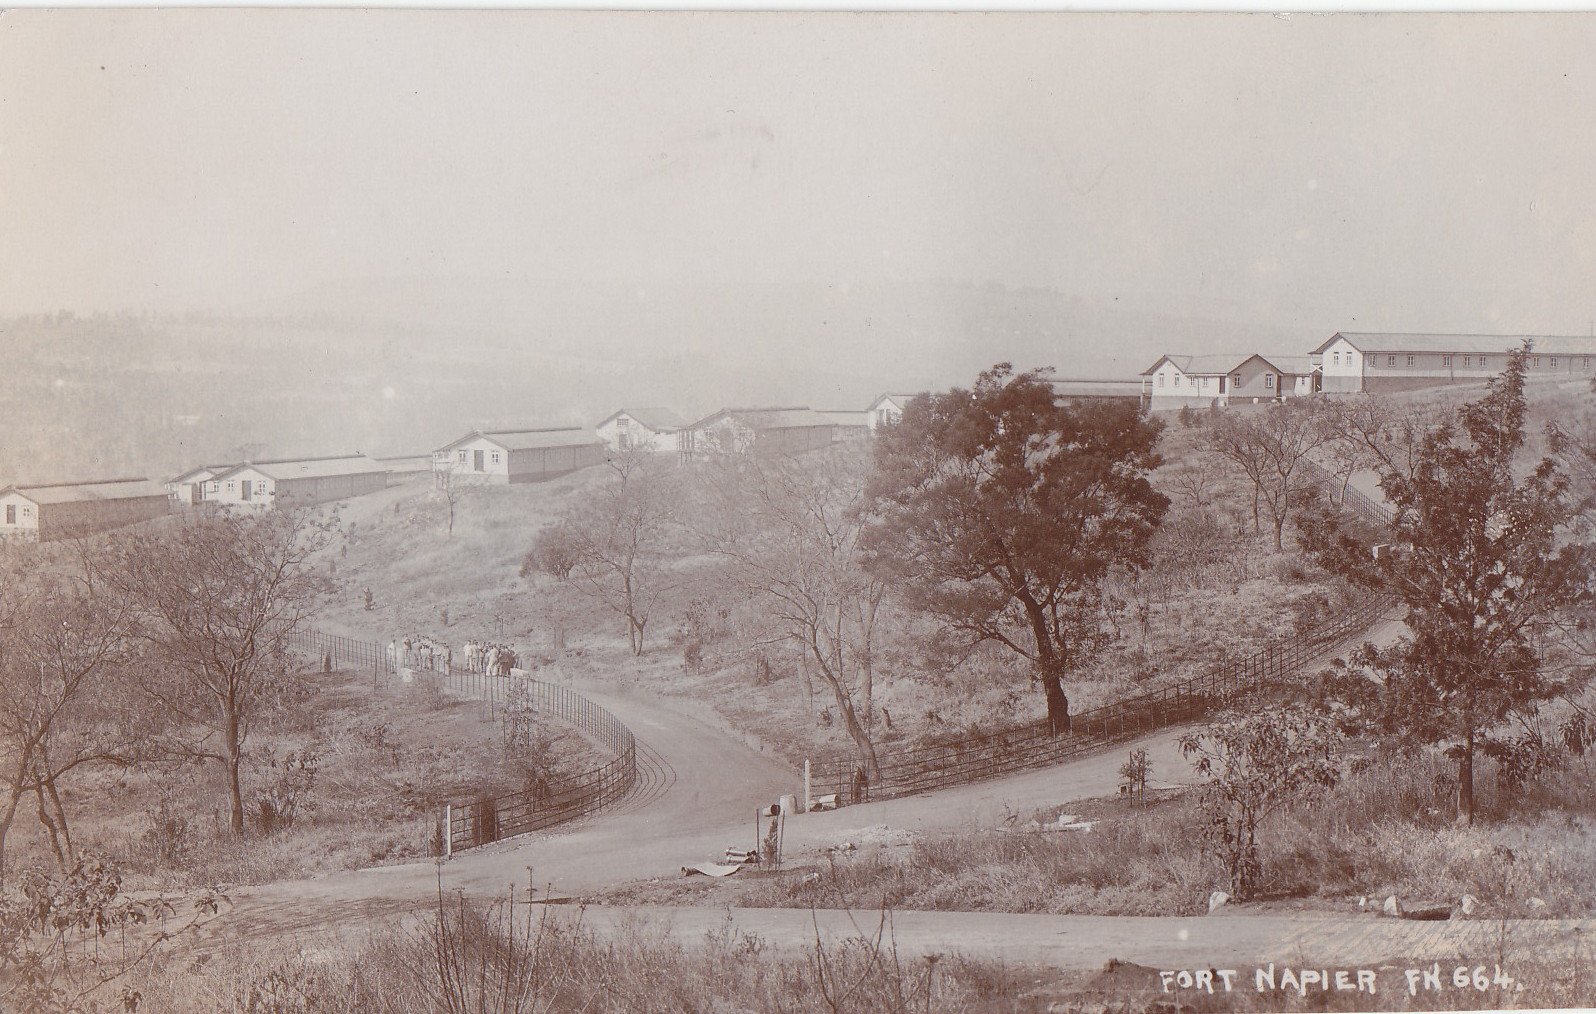 Generalansicht des Lagers Fort Napier